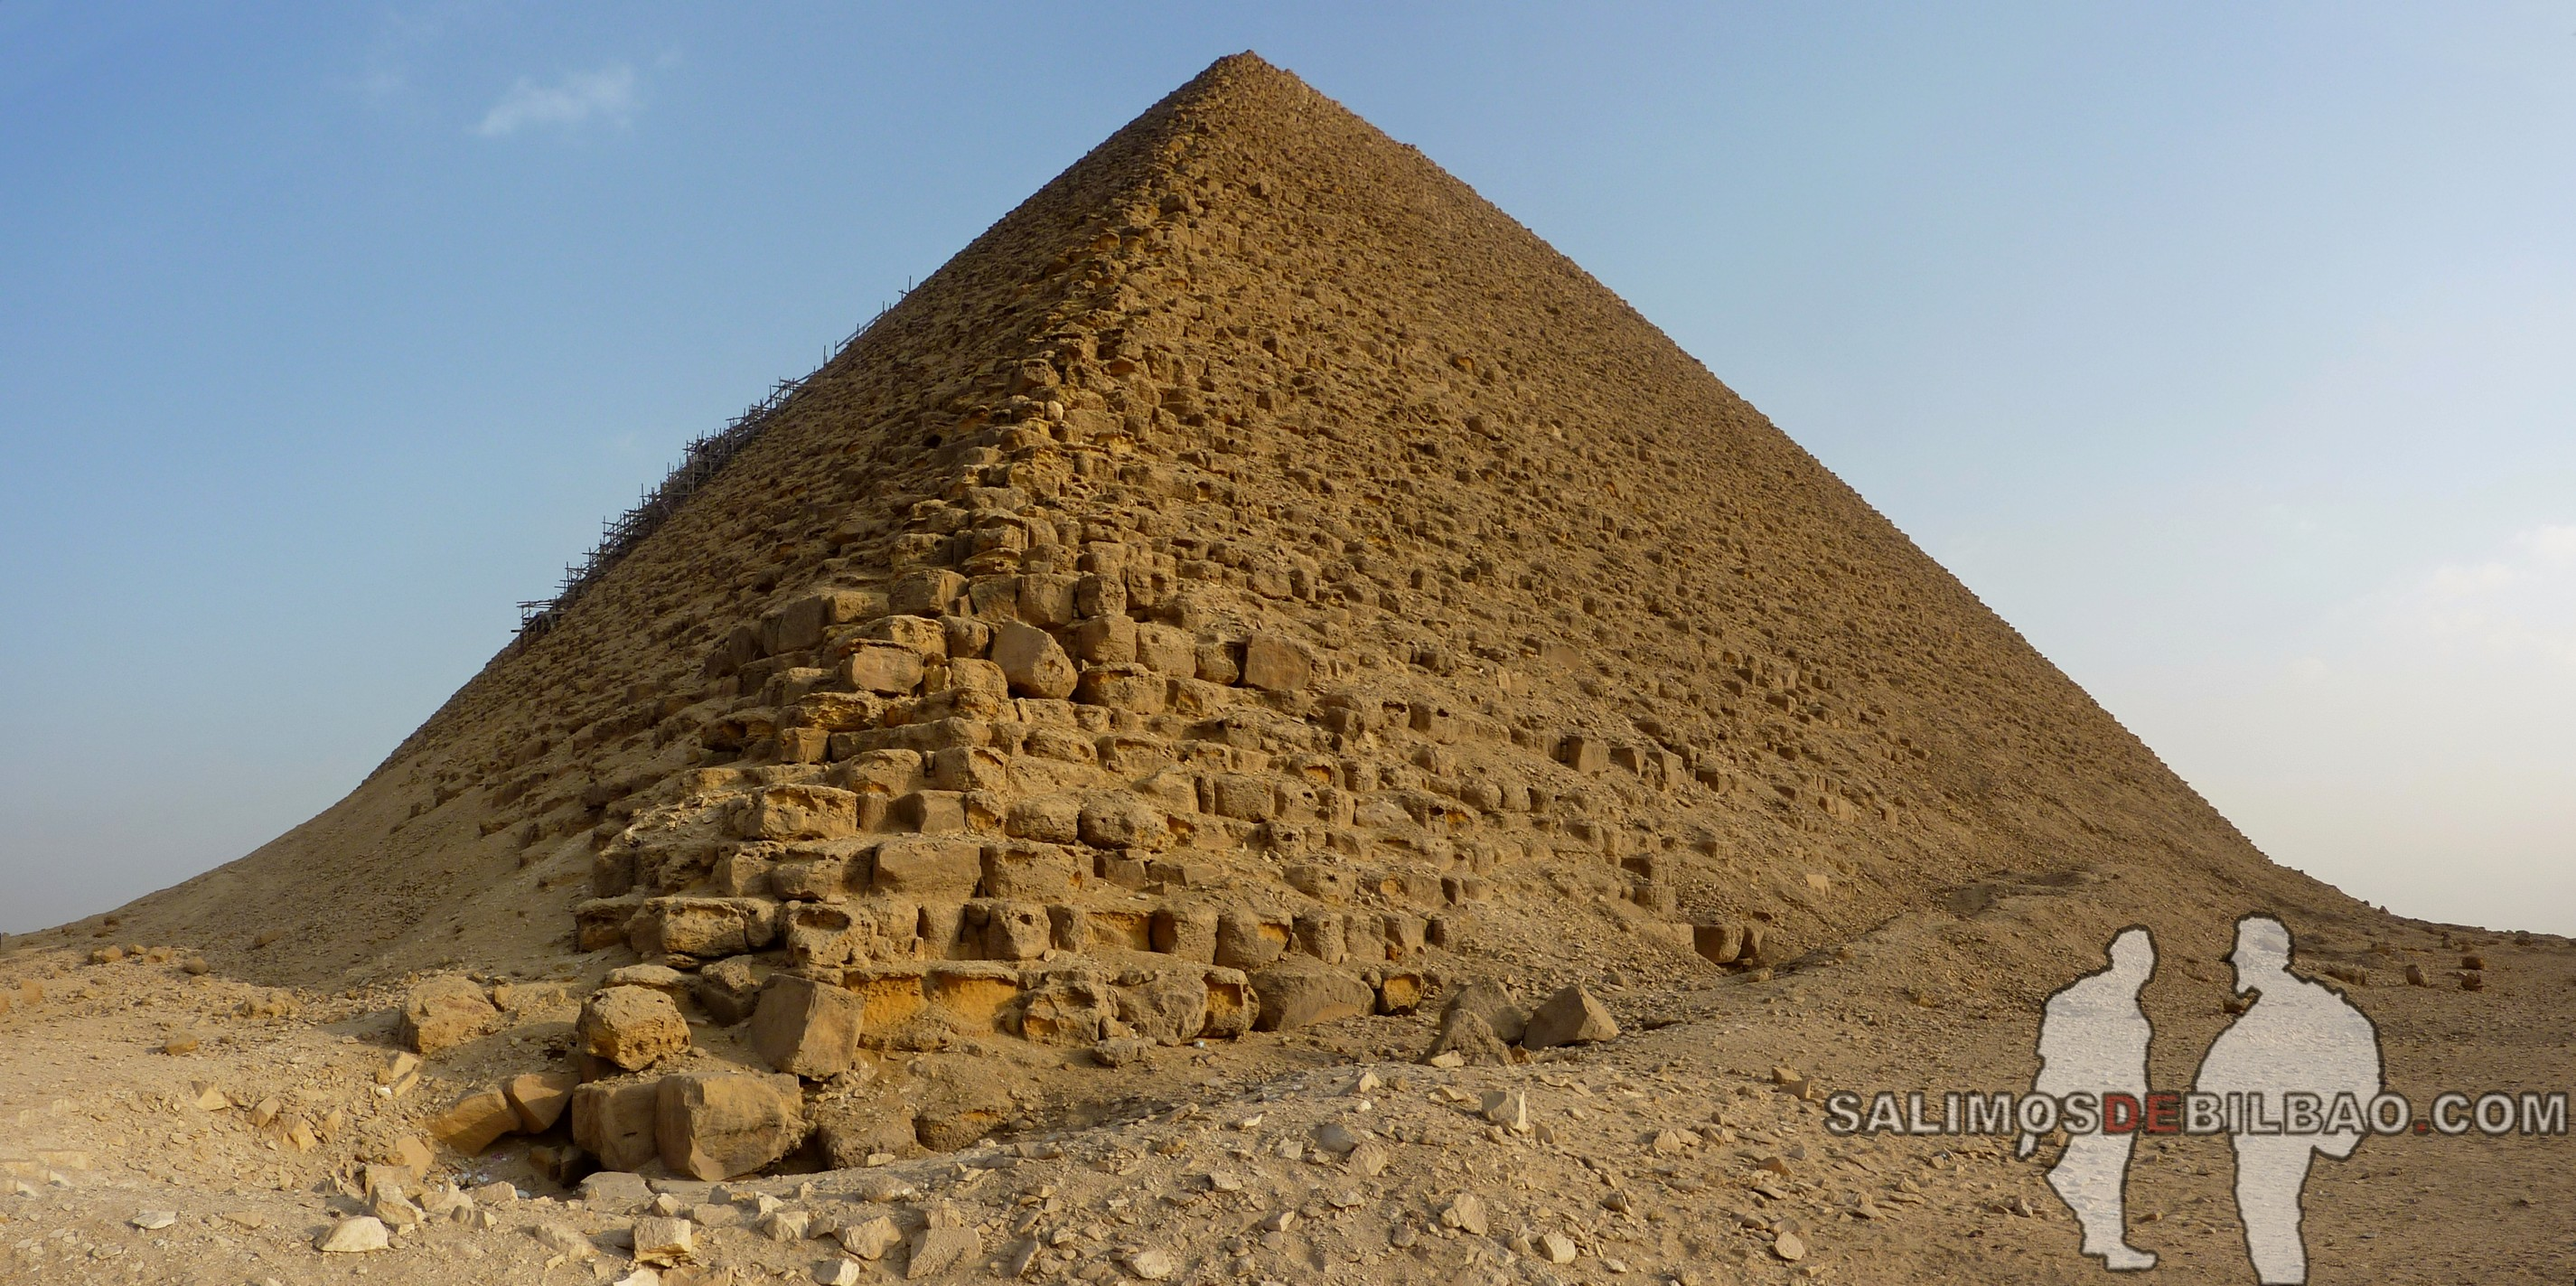 0223. Pano, Pirámide roja de Saqqara